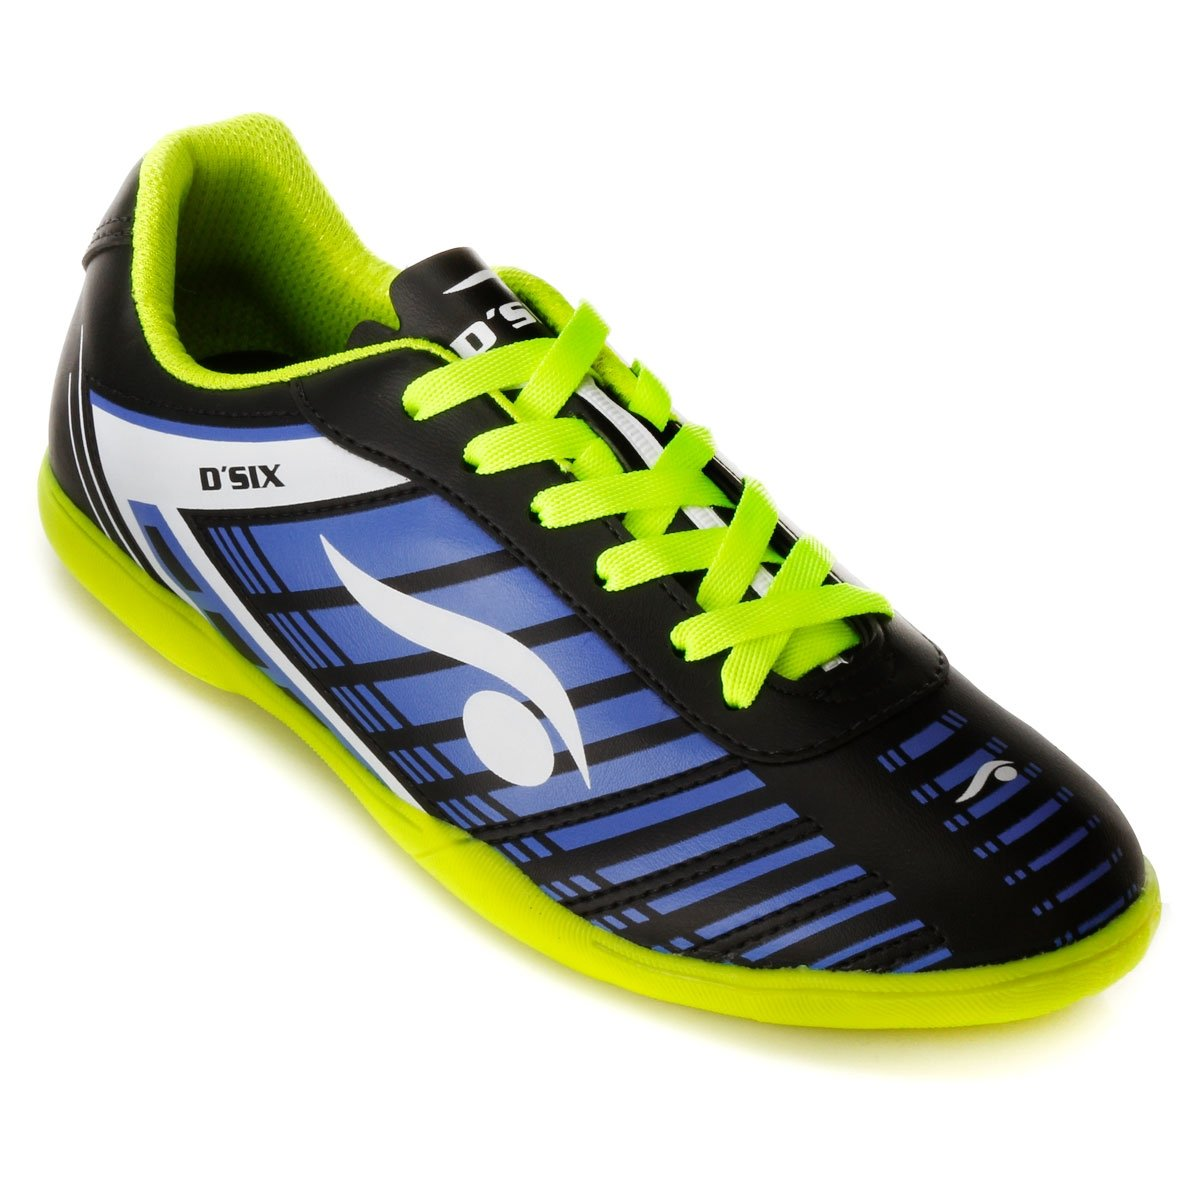 Tênis Futsal Dsix D17-6202 - Compre Agora  598954a5505d4